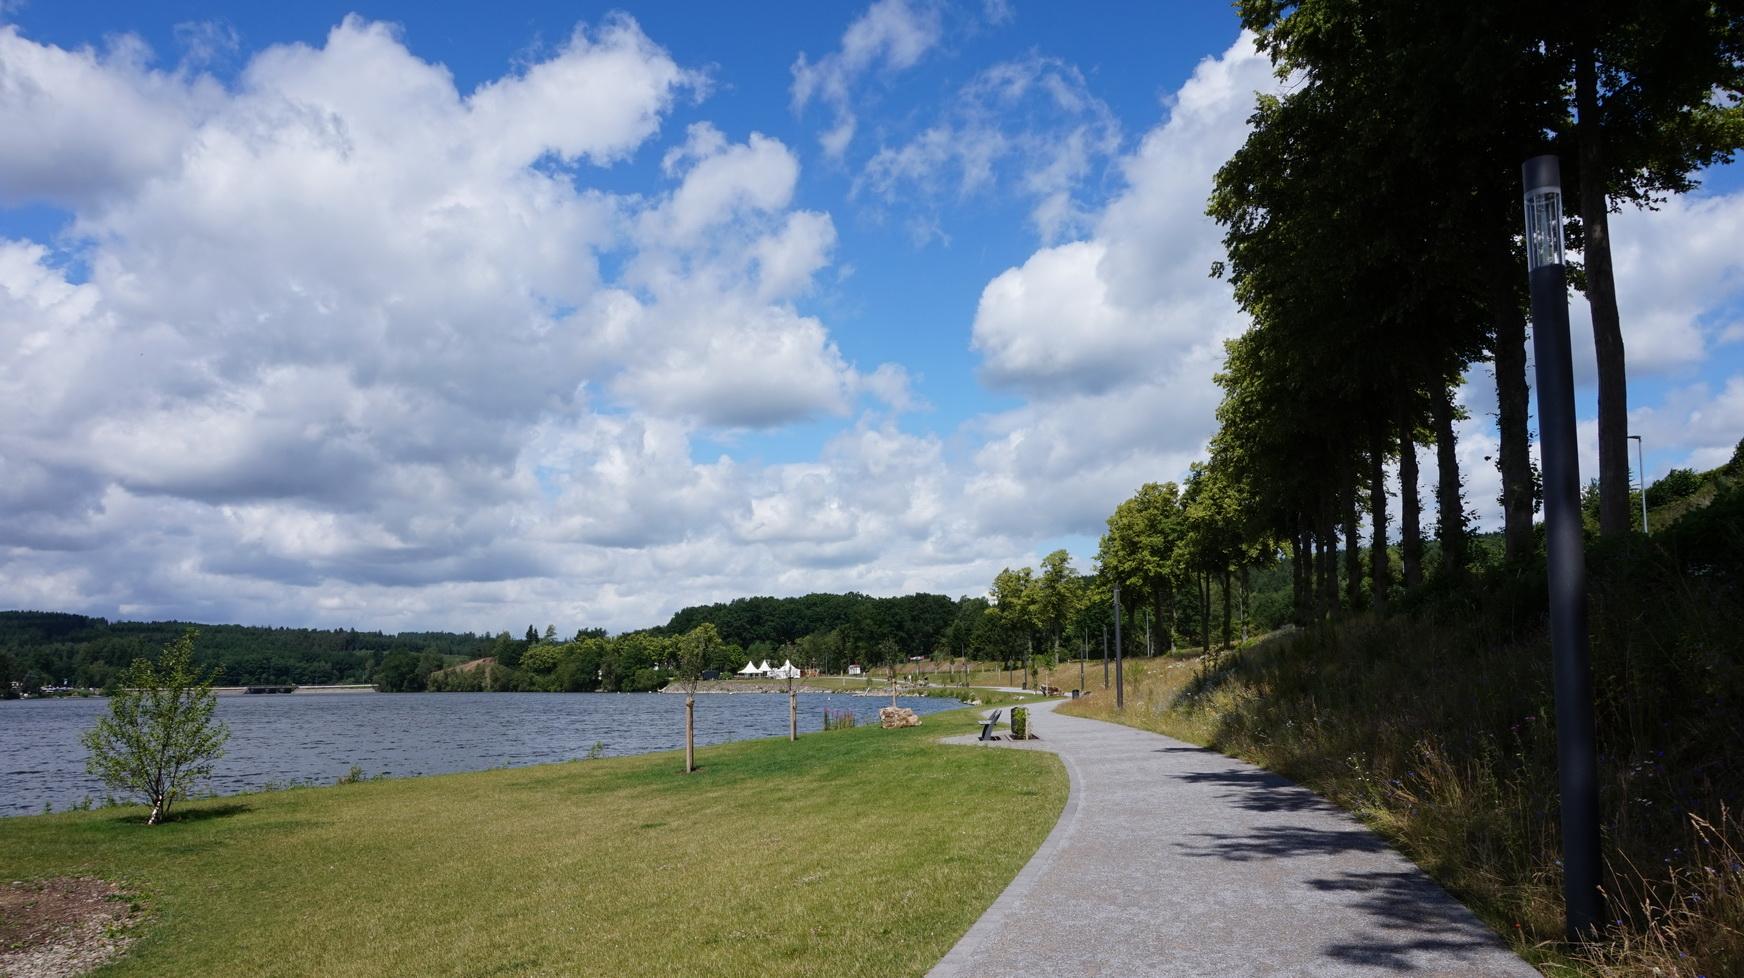 Wanderung Am2 Amecke Sauerland 27